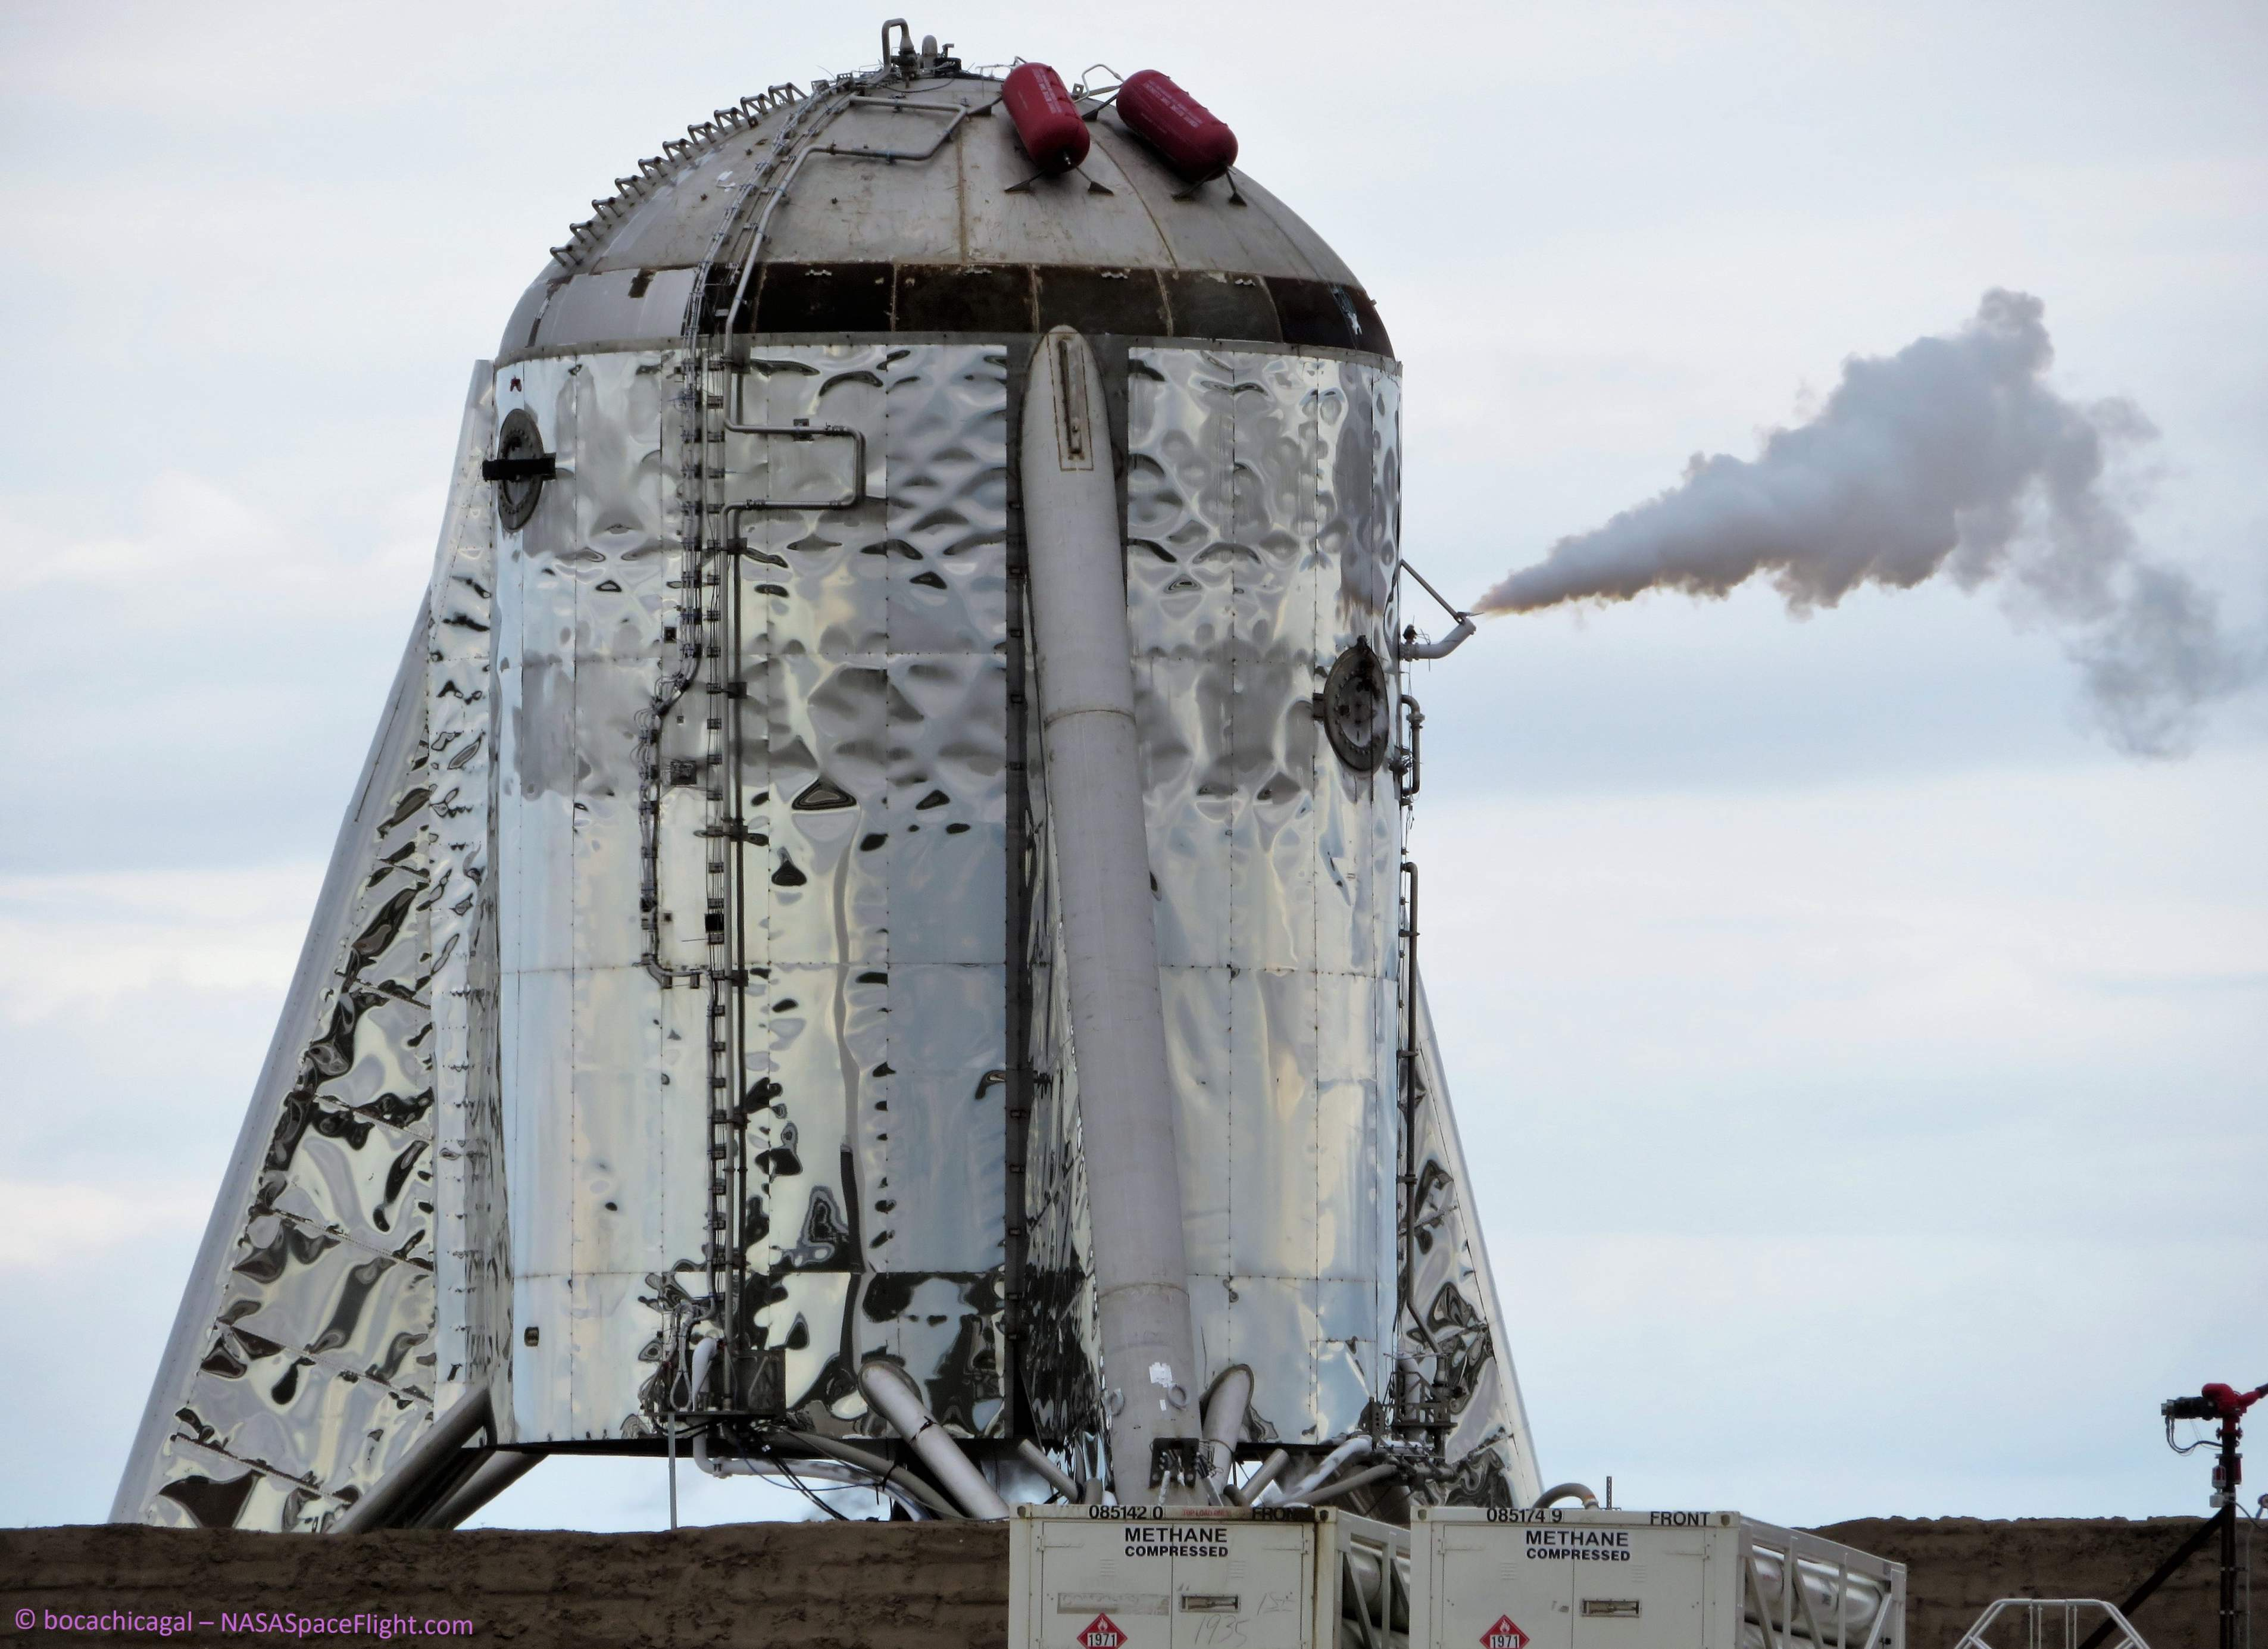 Boca Chica Starhopper testing 031819 (NASASpaceflight – bocachicagal) 2 (c)